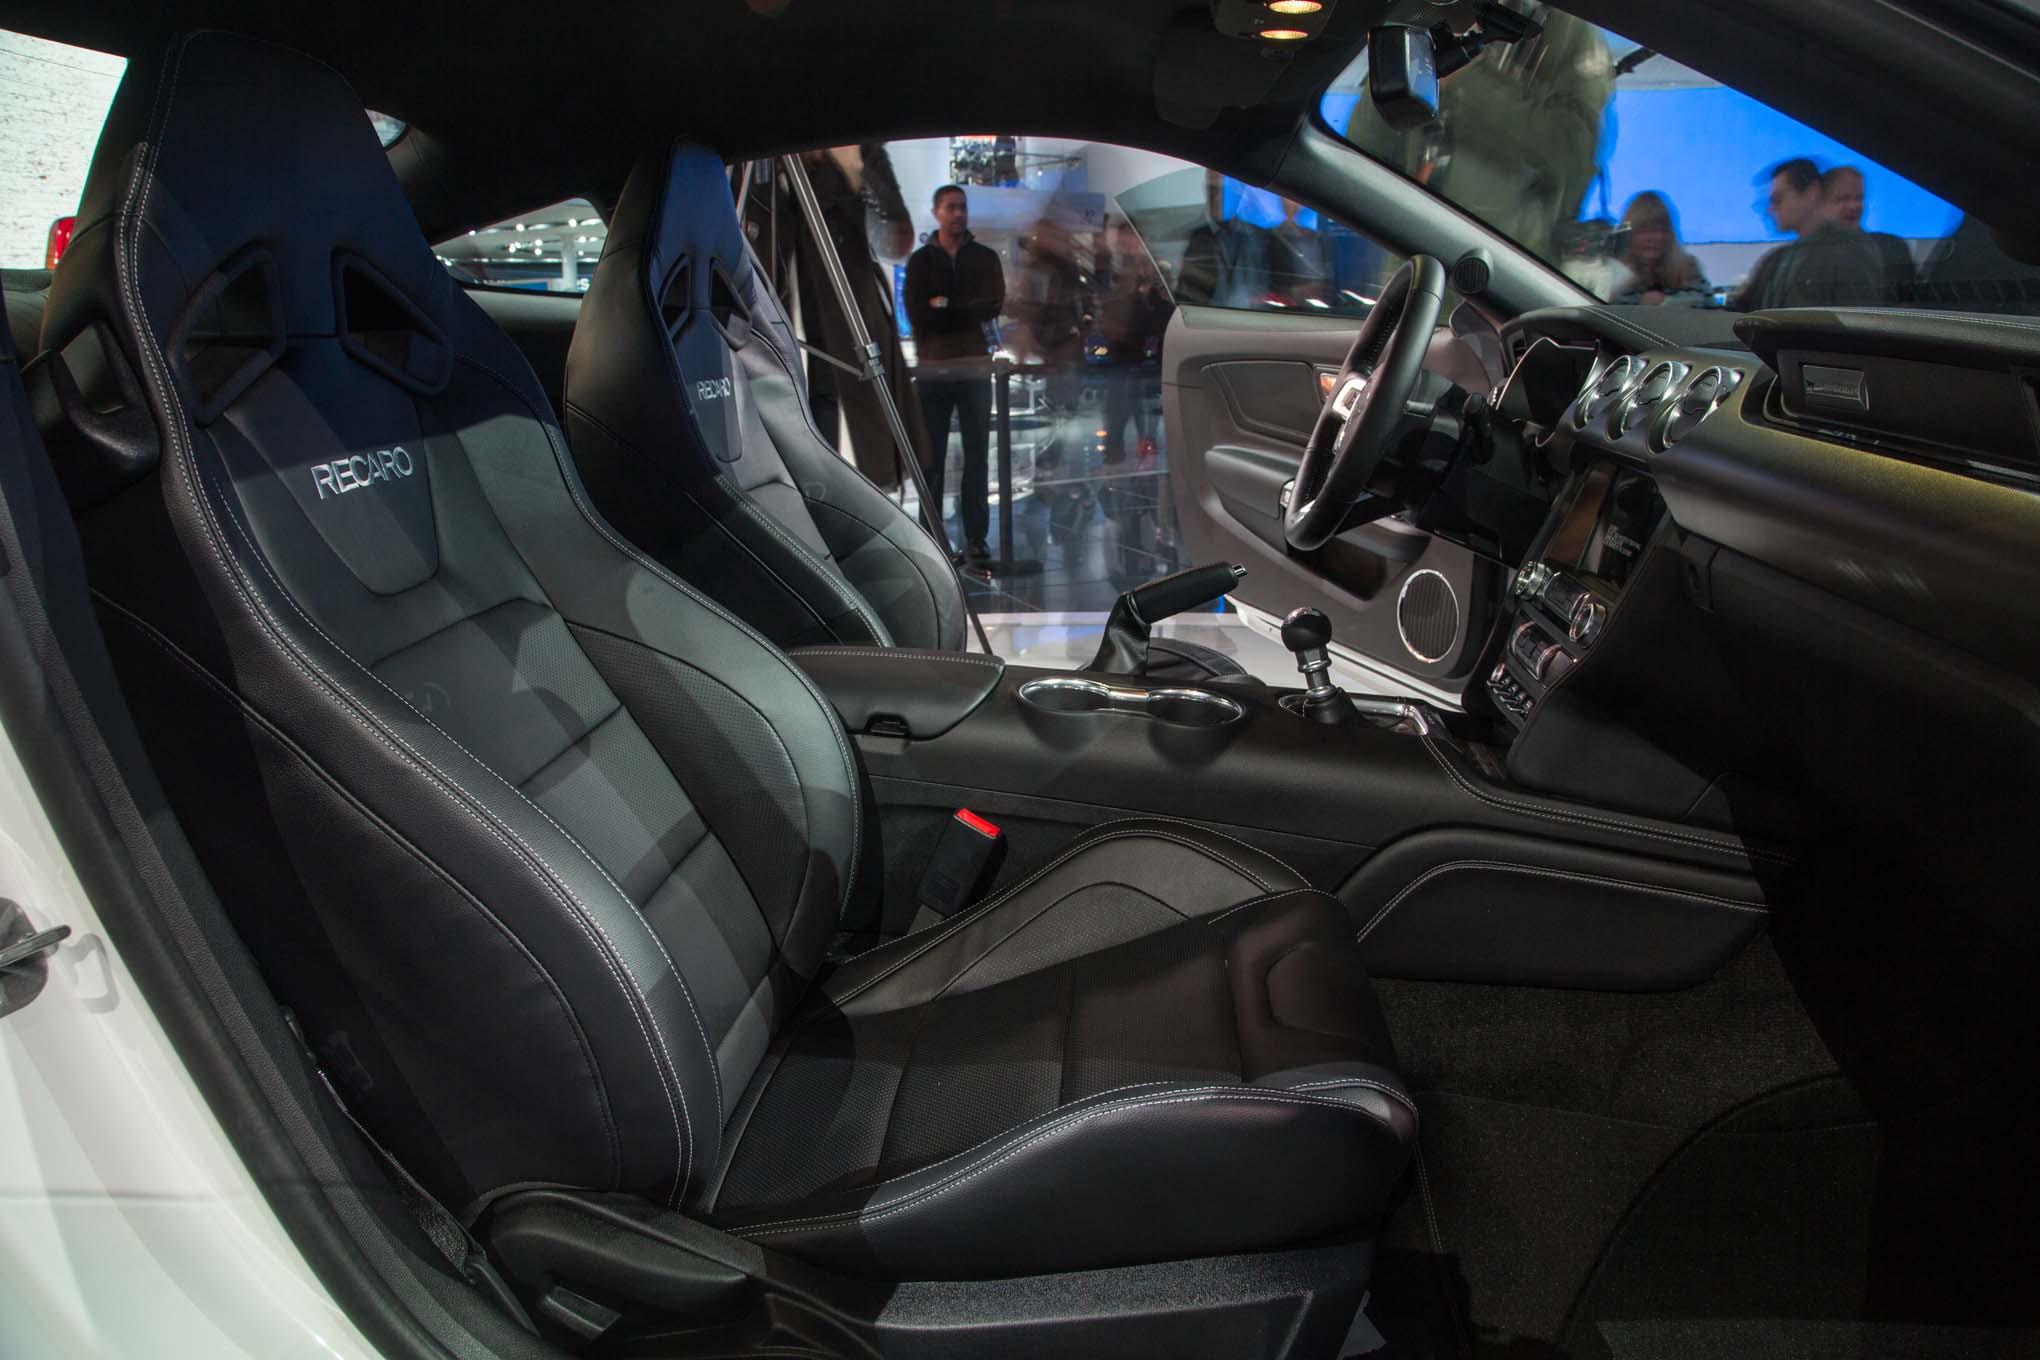 2018 Ford Mustang GT front interior seats - Motor Trend en ...